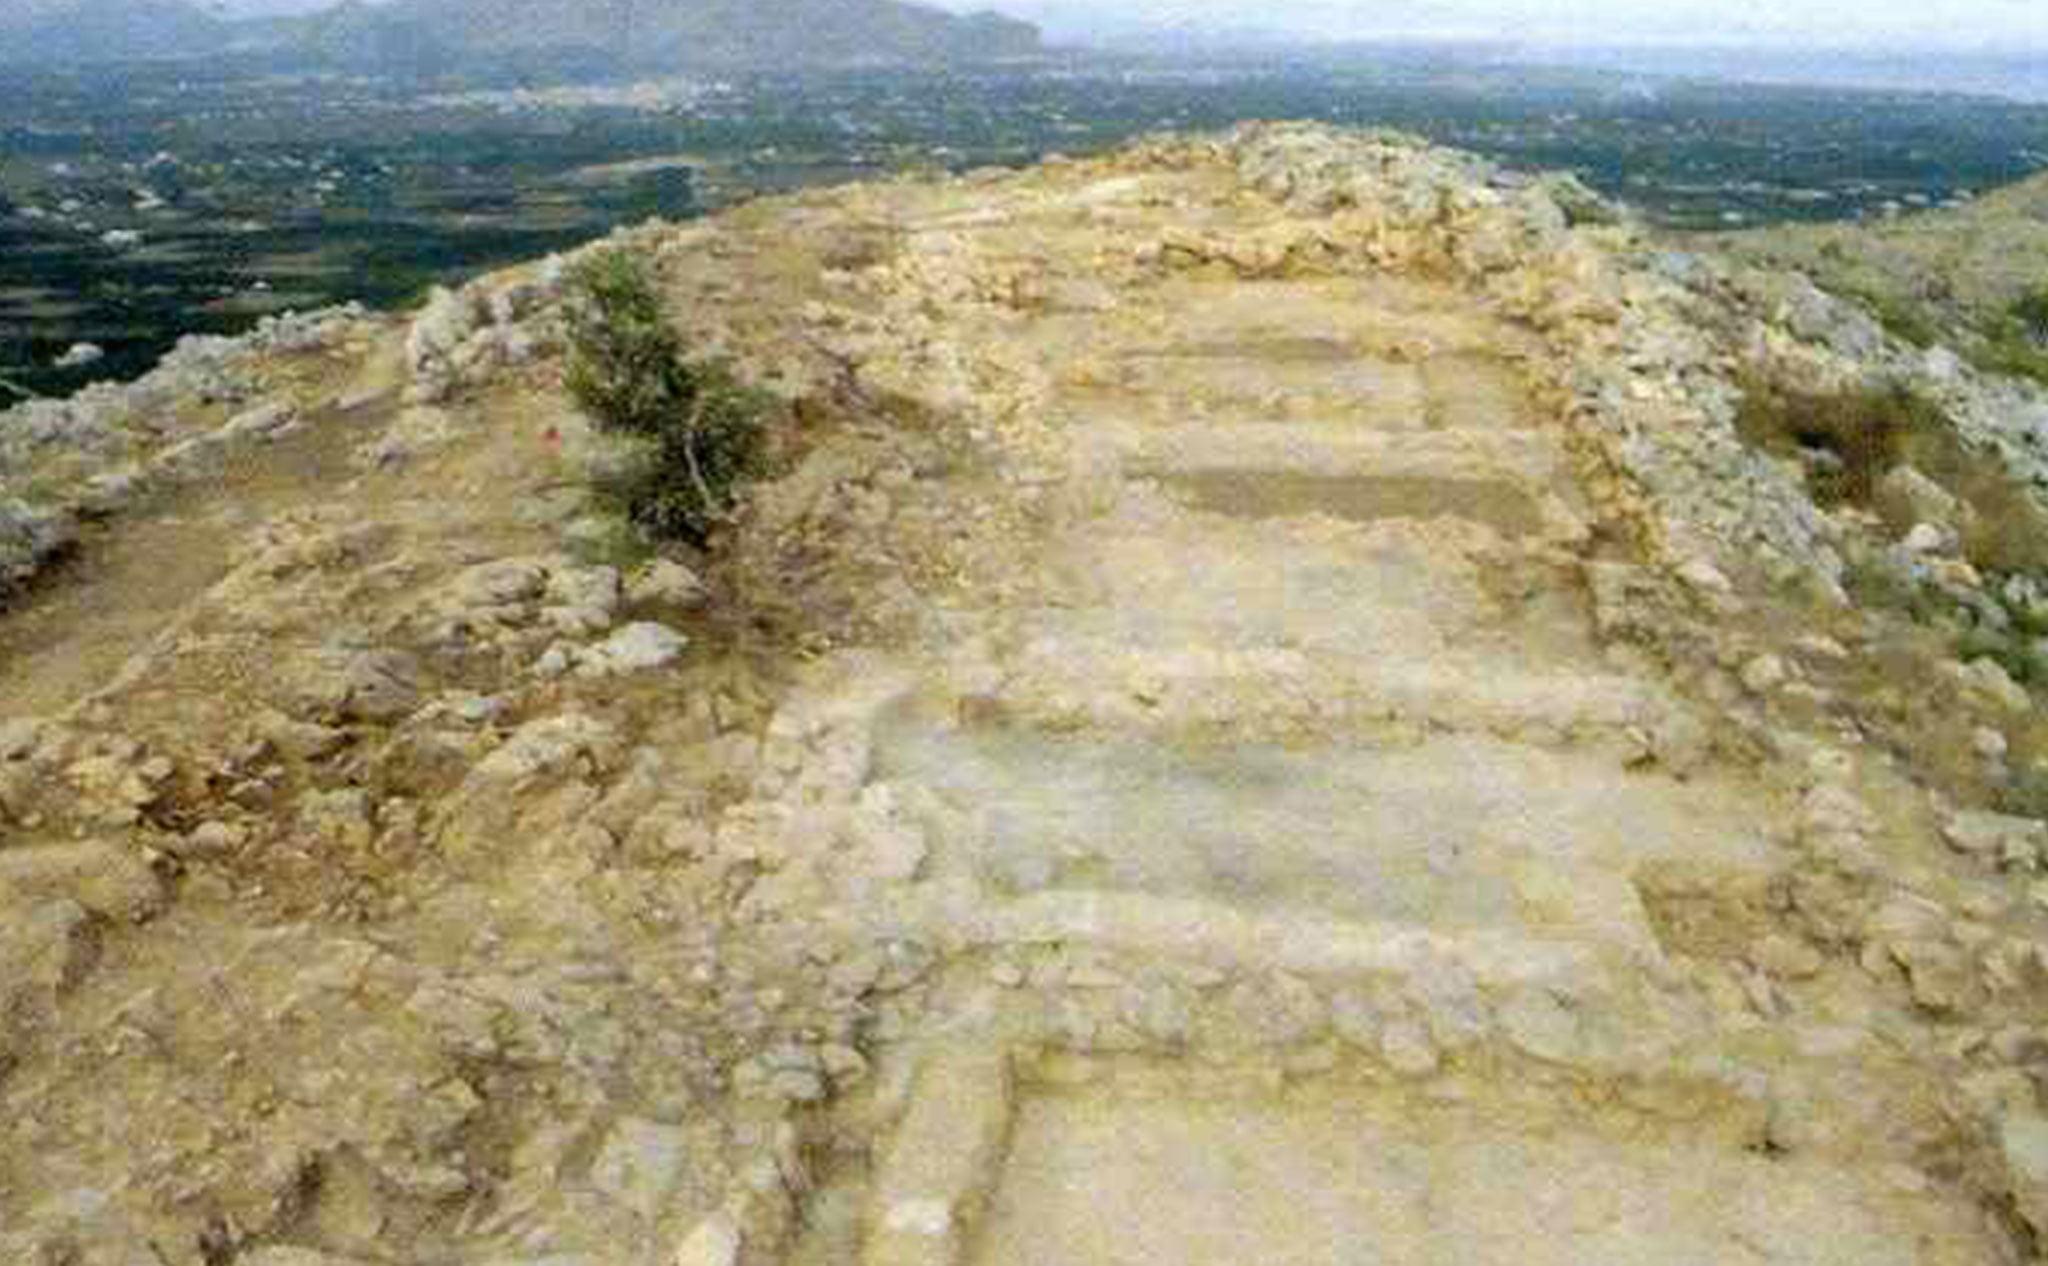 Asentamiento íbero en el Montgó: l'Alt de Benimaquia